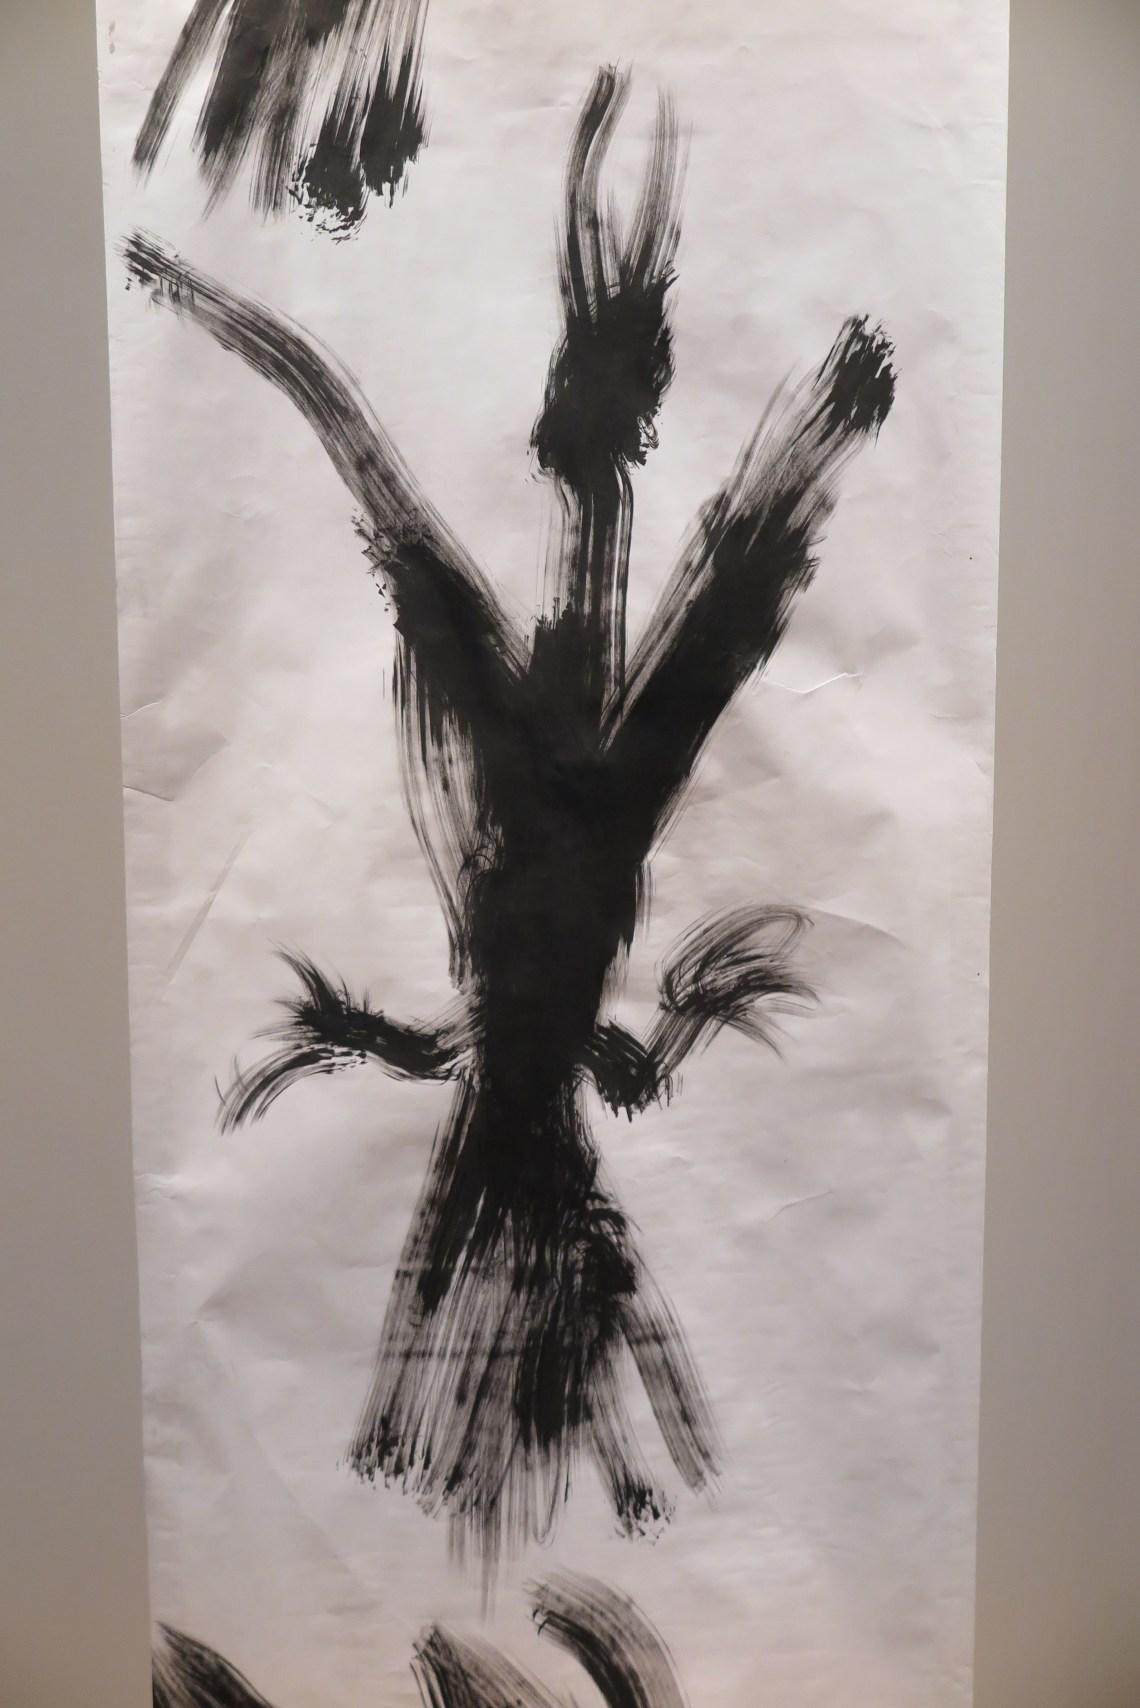 Judit Reigl - Oiseaux series - 2012 (detail)